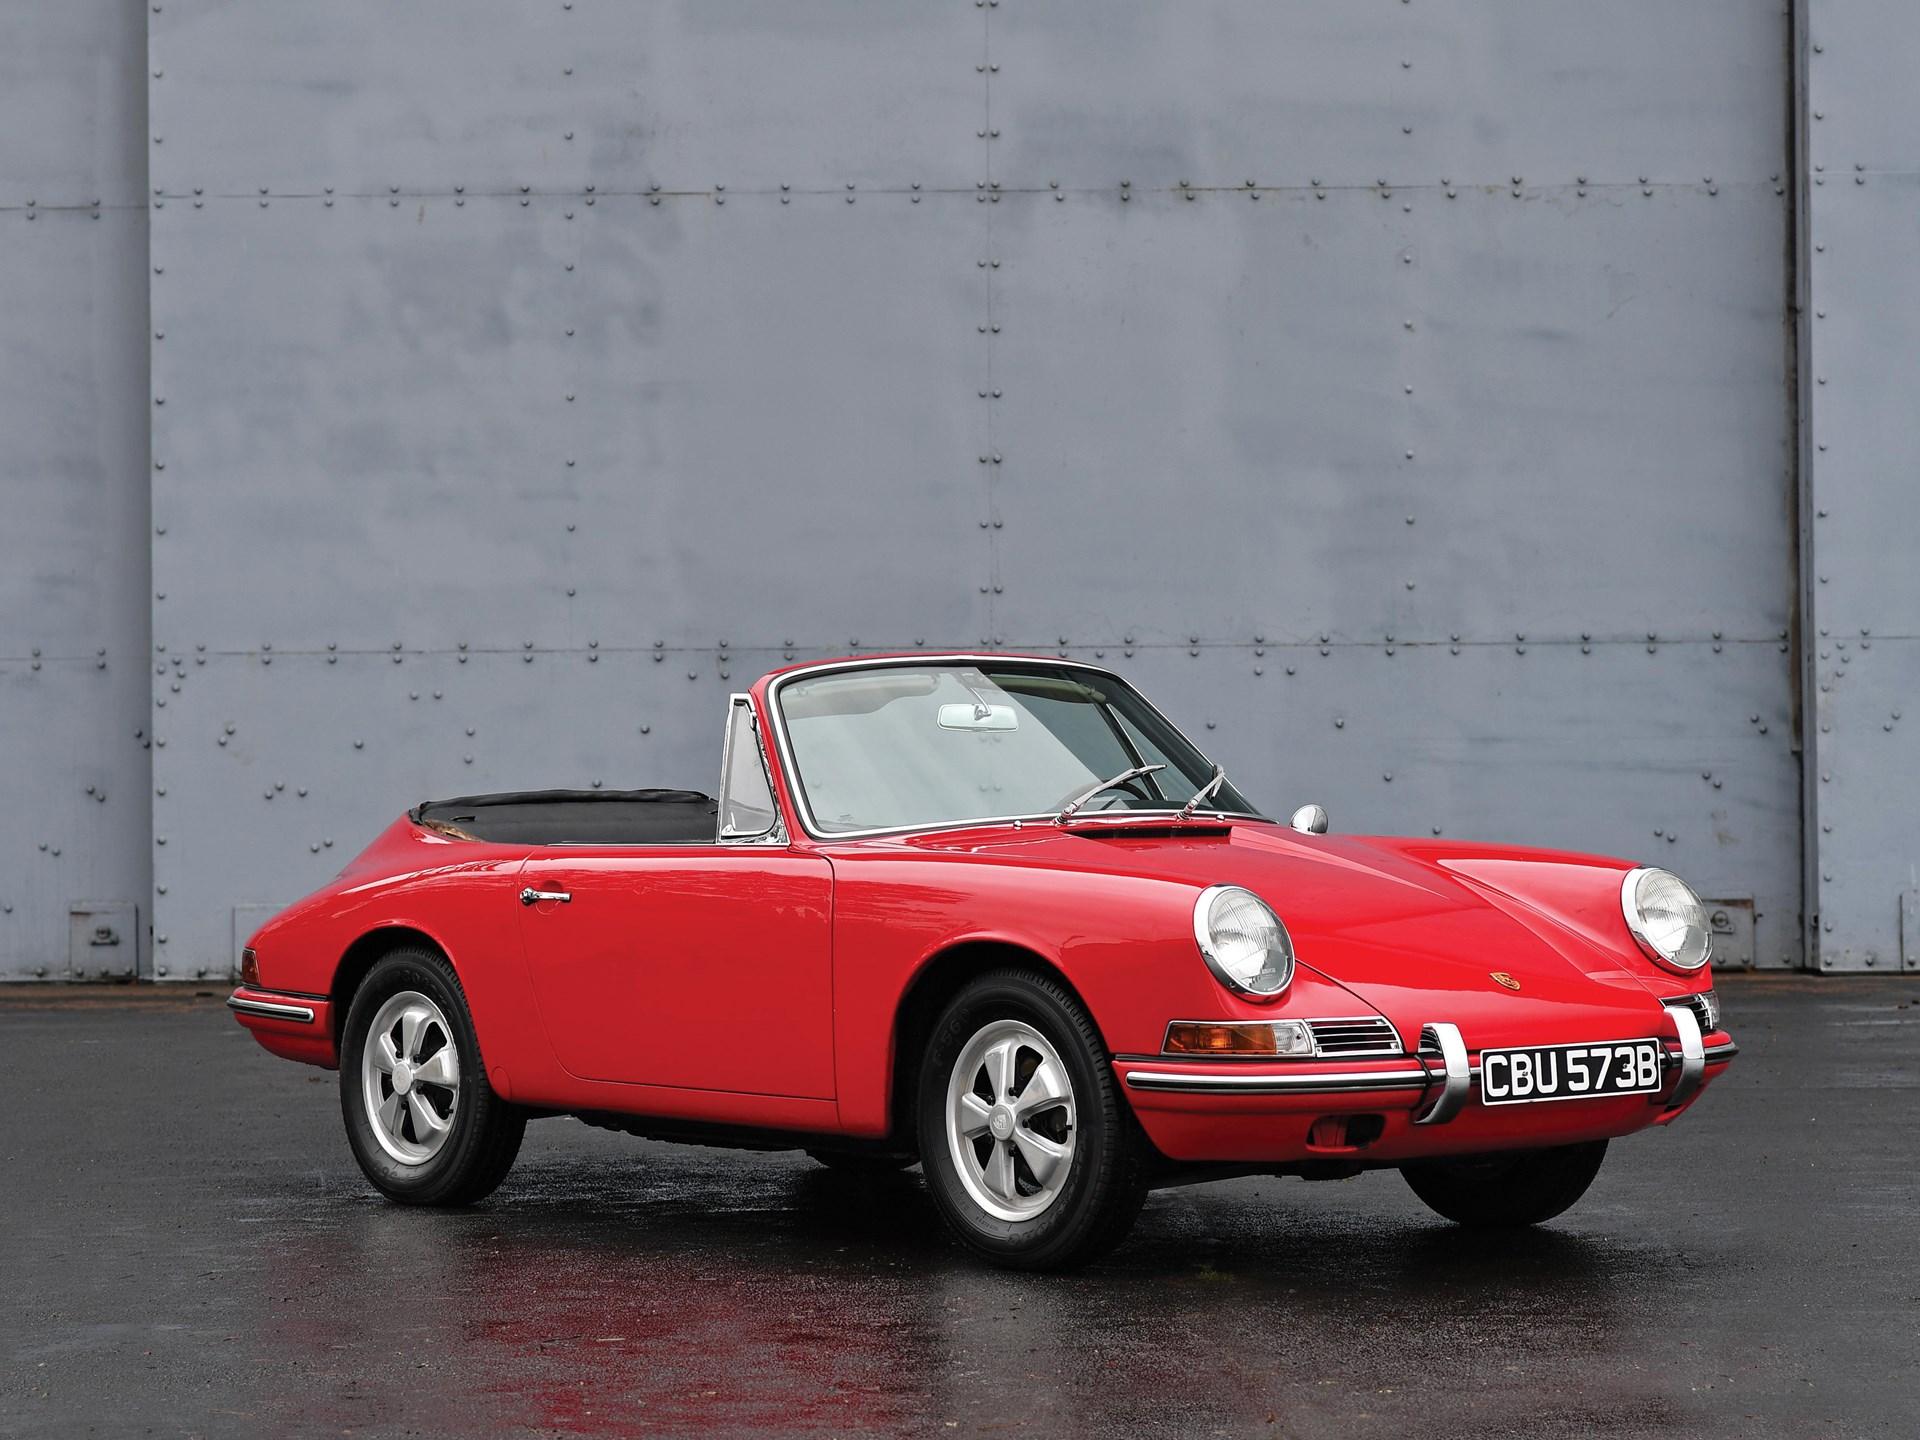 RM Sotheby's - 1964 Porsche 901 Cabriolet Prototype by Karmann ...